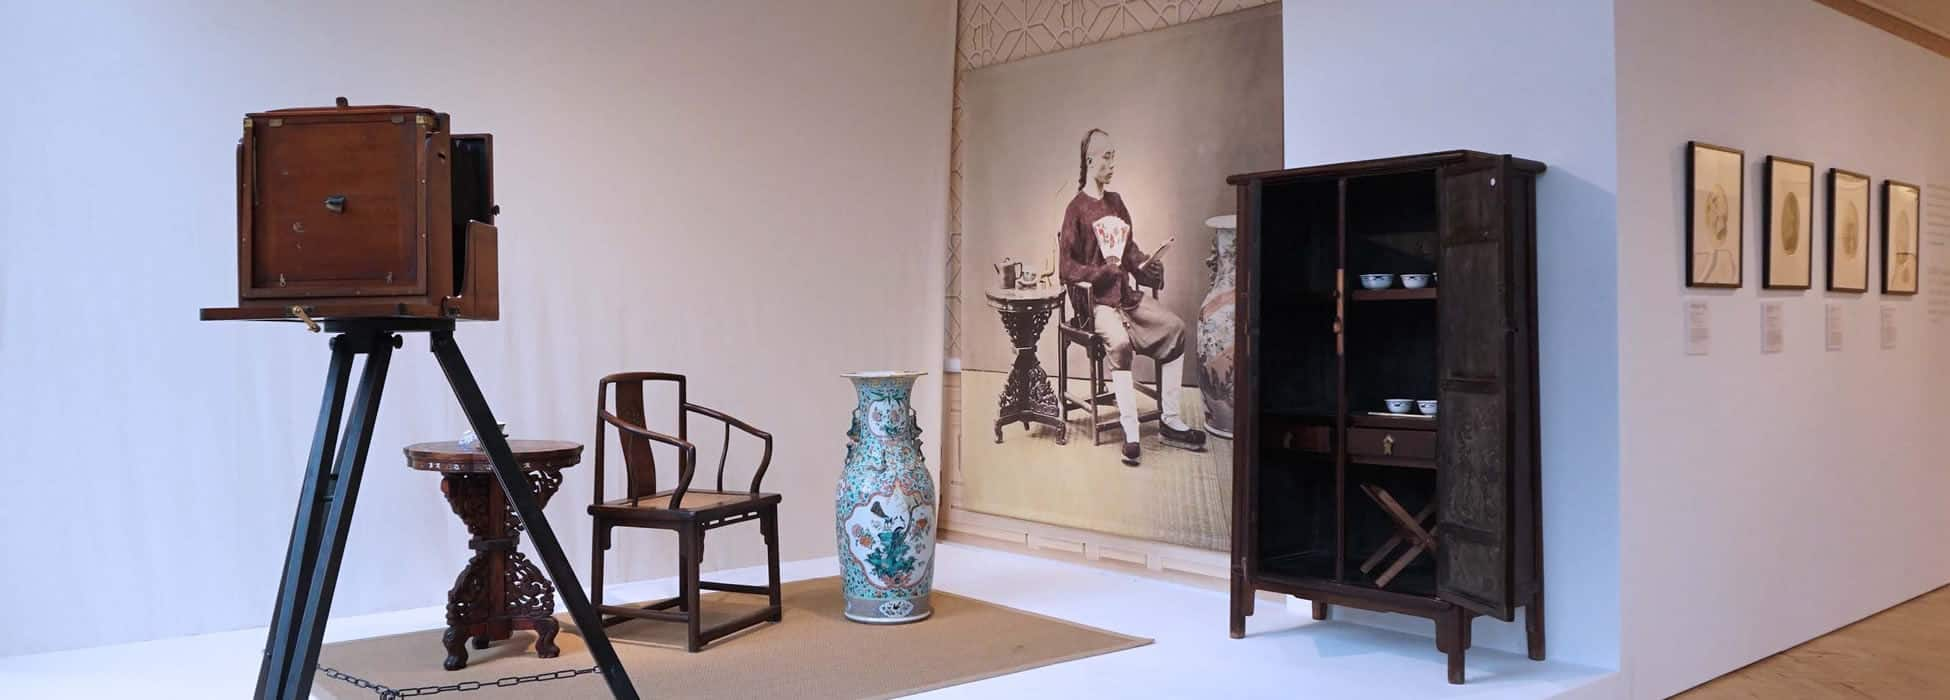 Photographic Exhibition Design